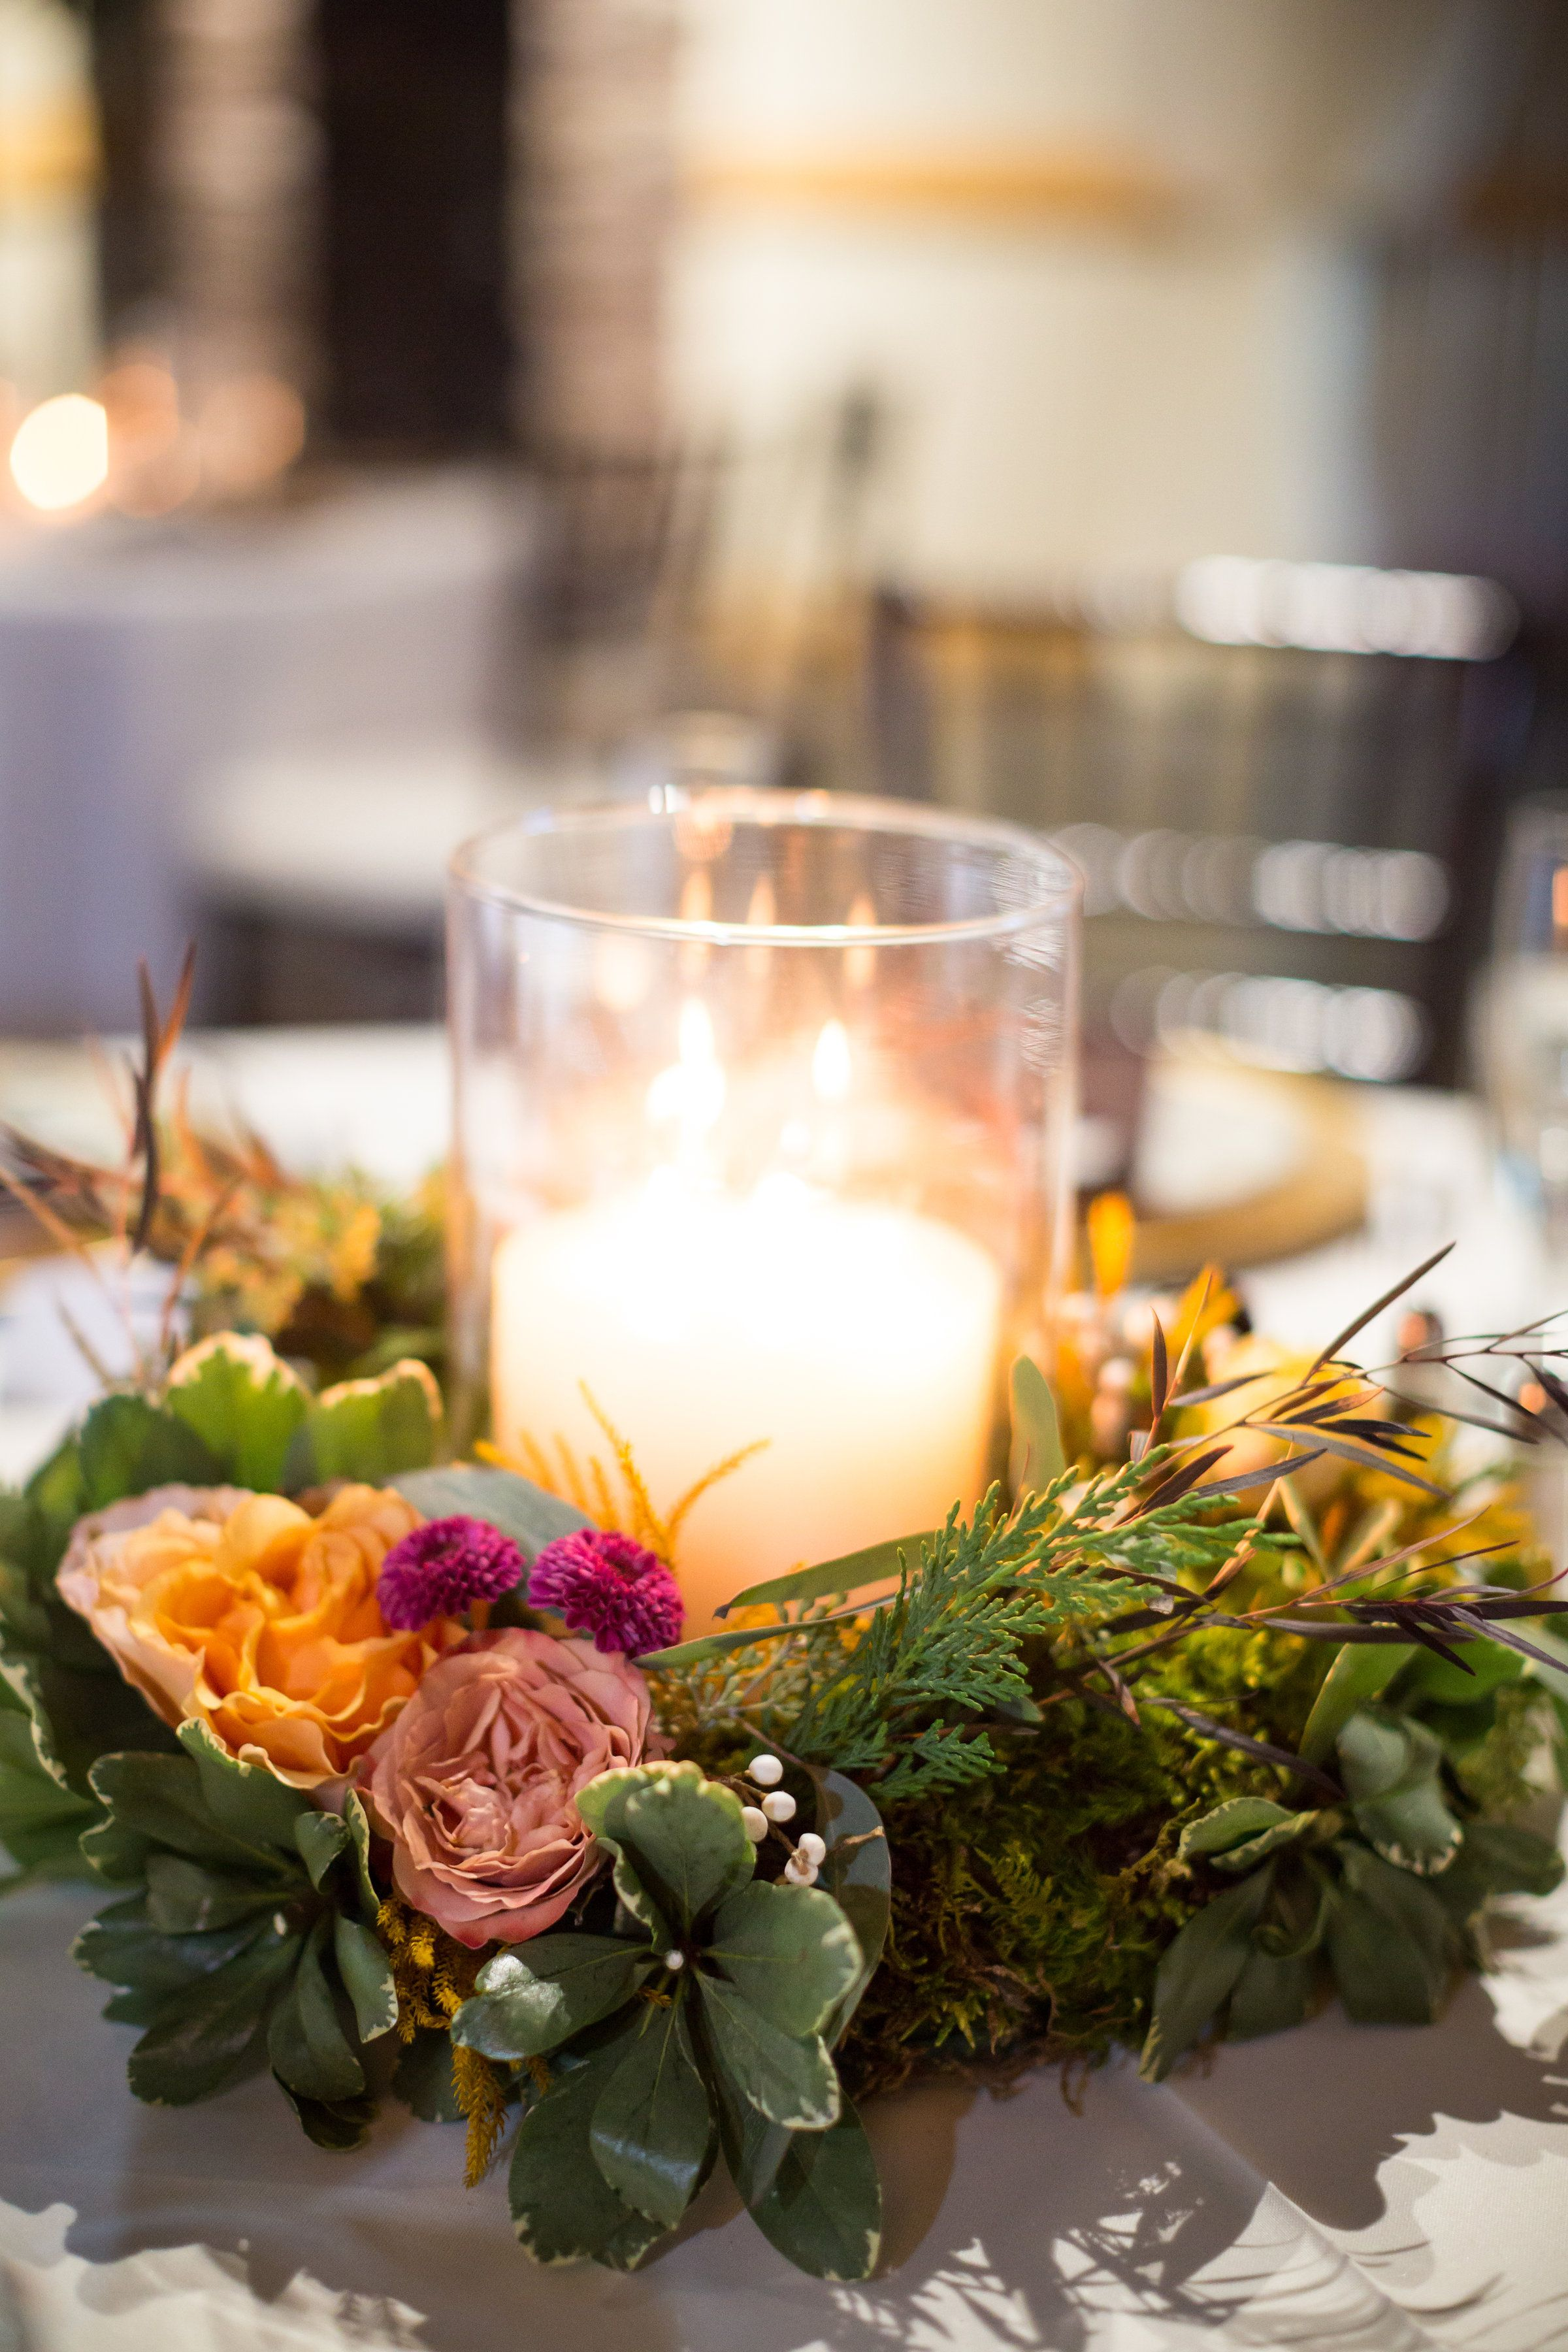 wallpaper diy wedding pillars of desktop high quality barn reception featured table arrangements lush greenery moss